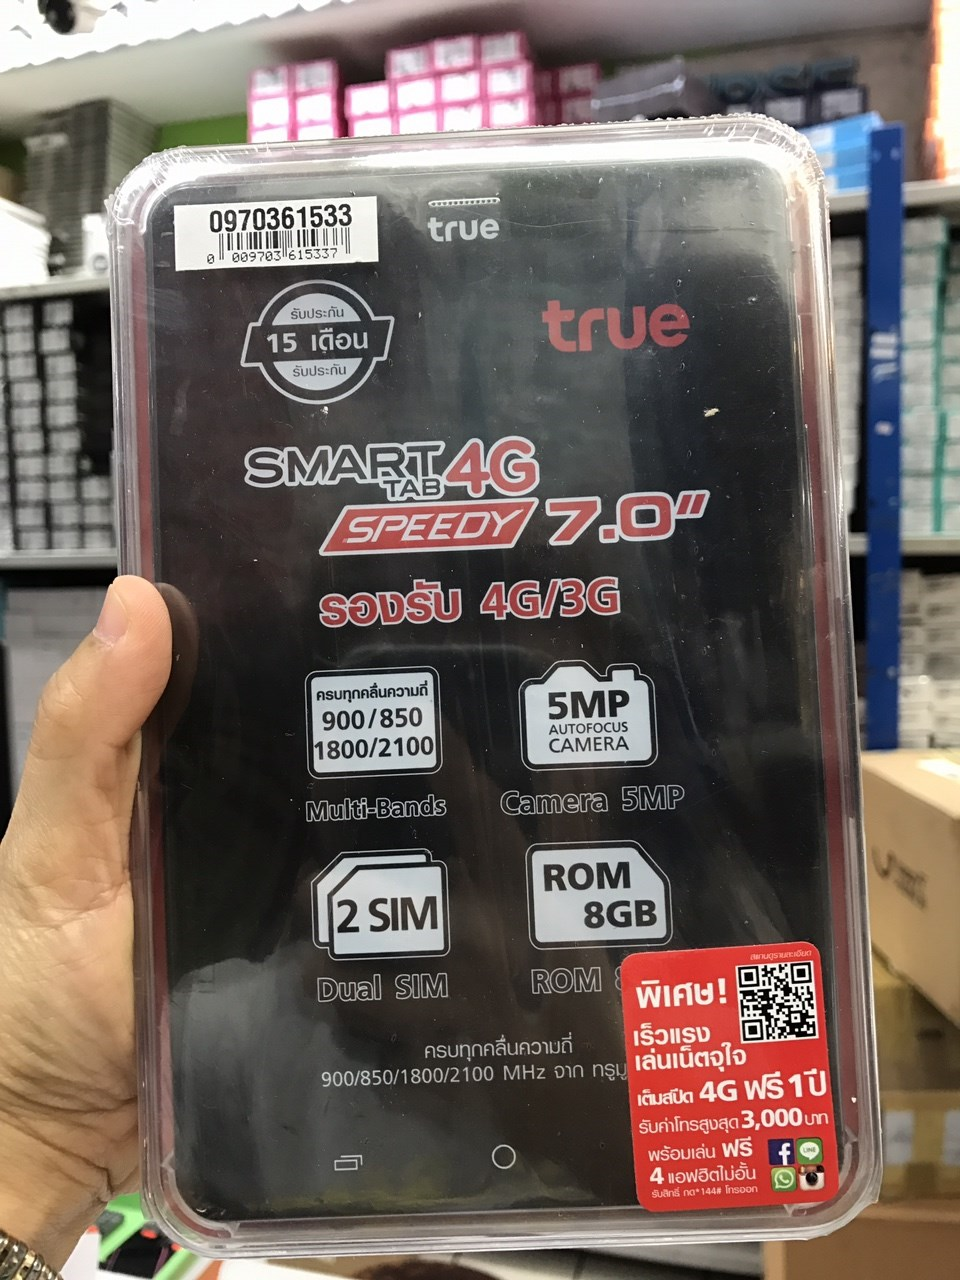 True Smart 4G SPEEDY 4.0 4GB